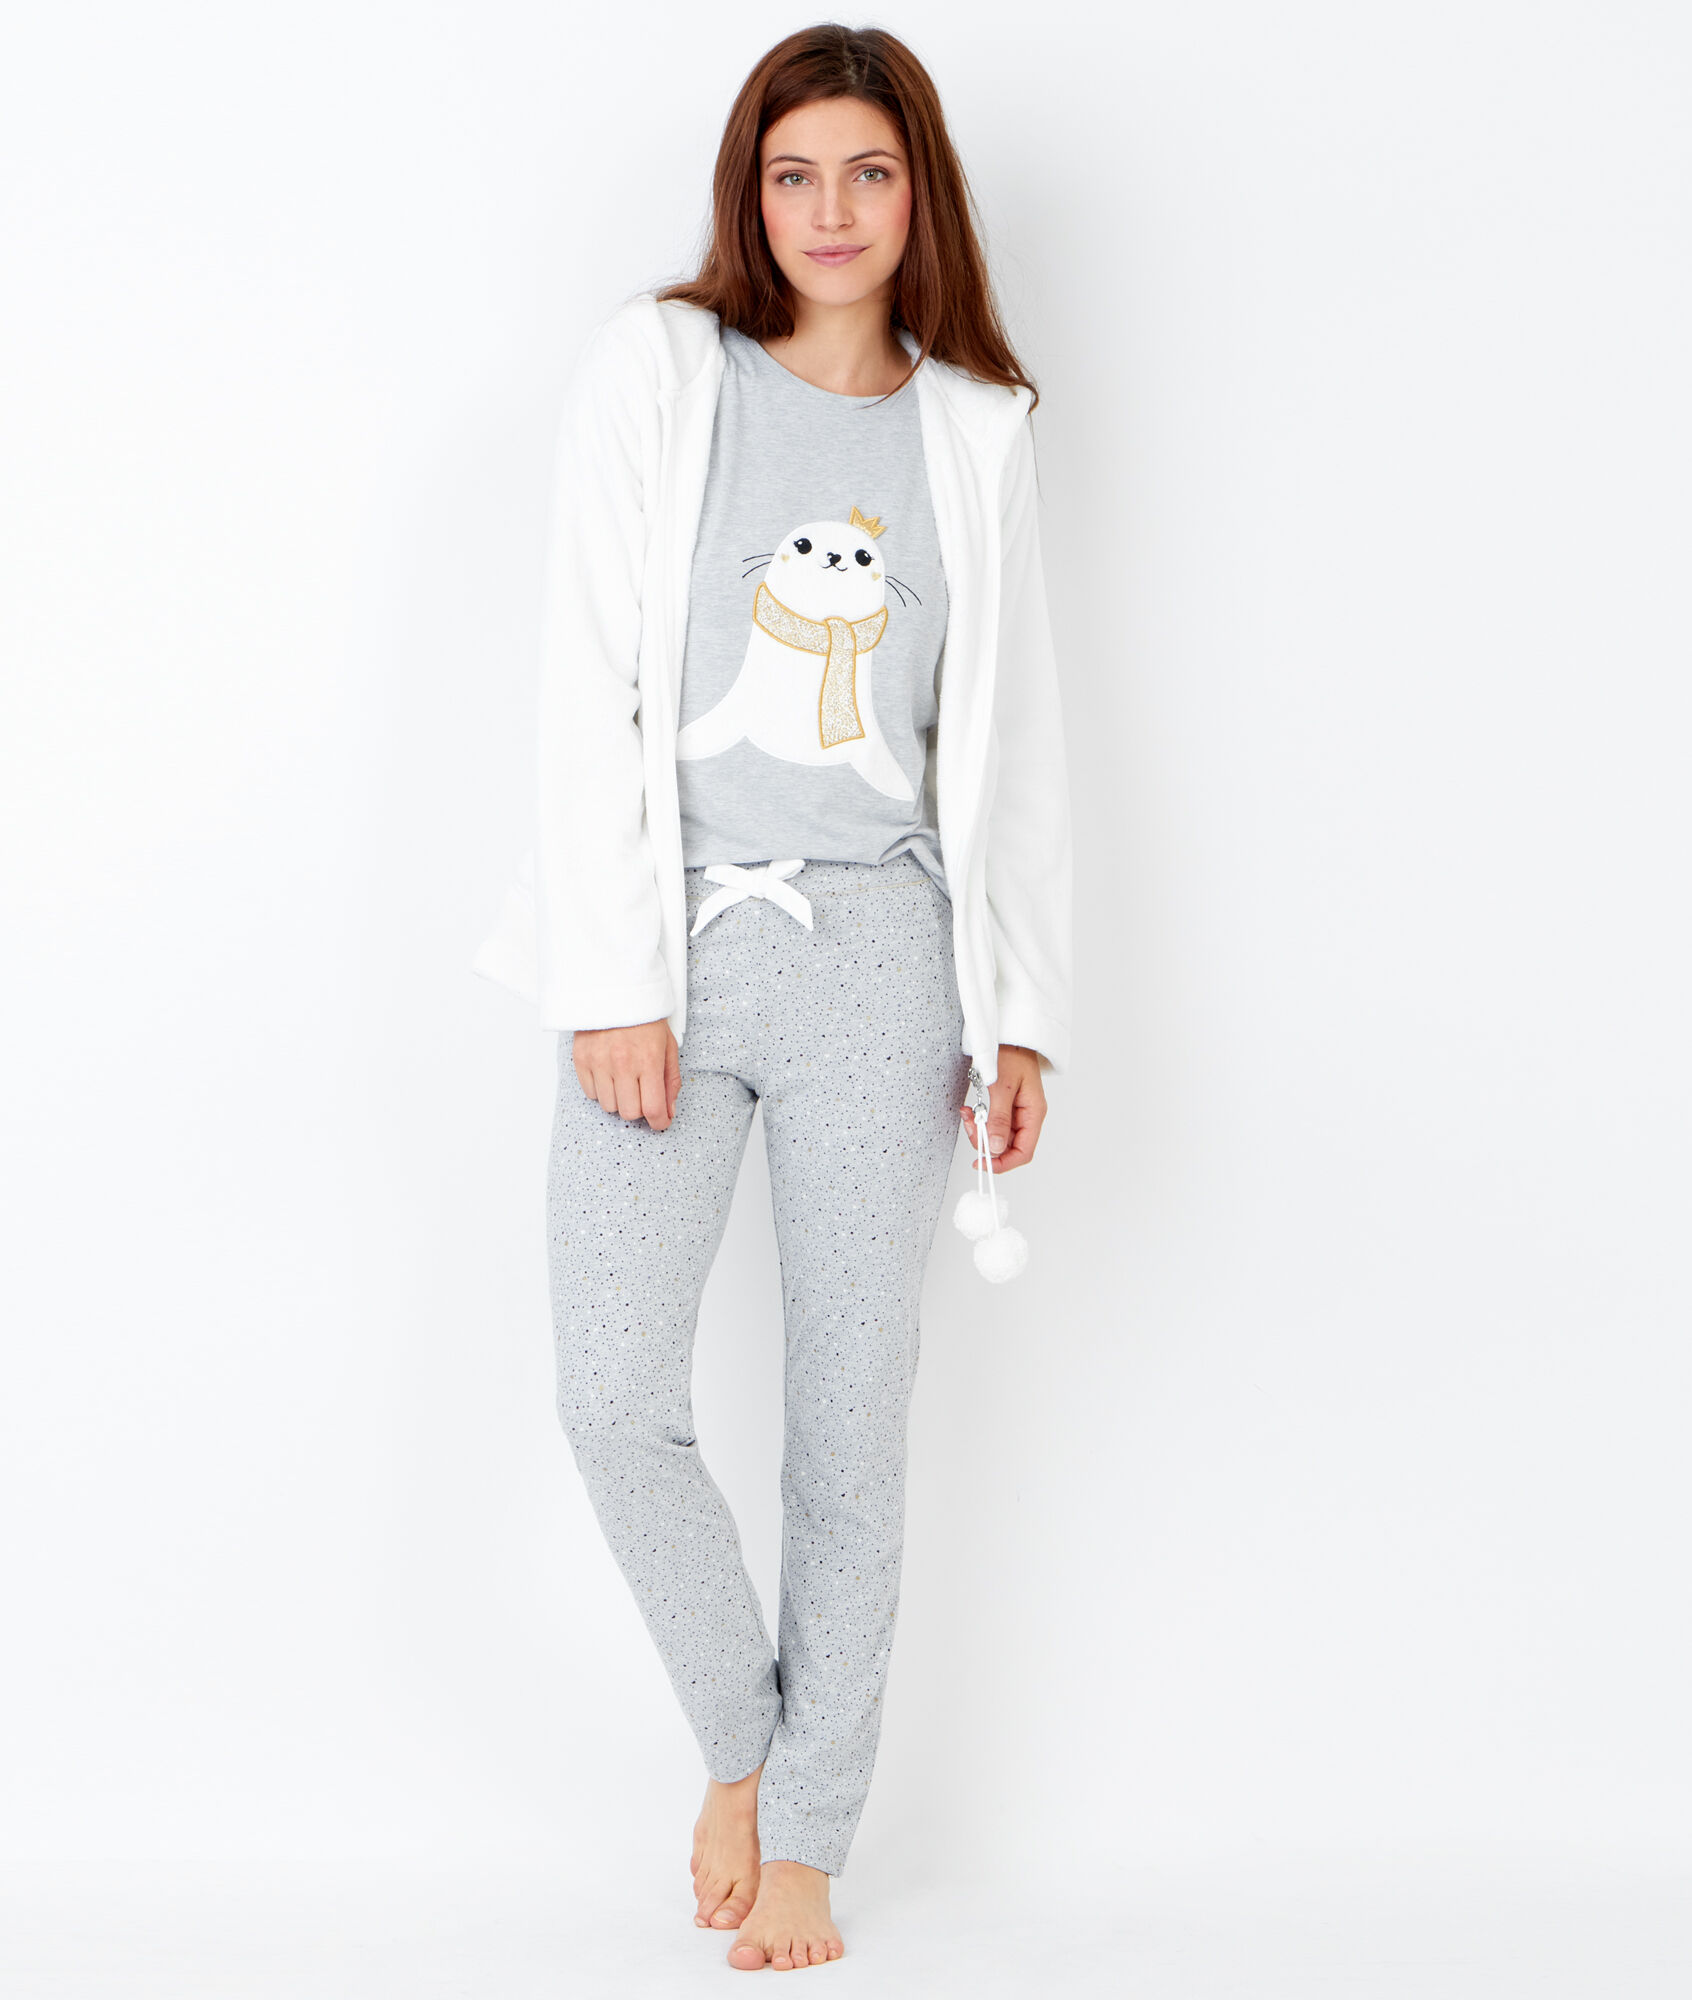 bebe phoque pyjama 3 pi ces pantalon imprim et veste. Black Bedroom Furniture Sets. Home Design Ideas